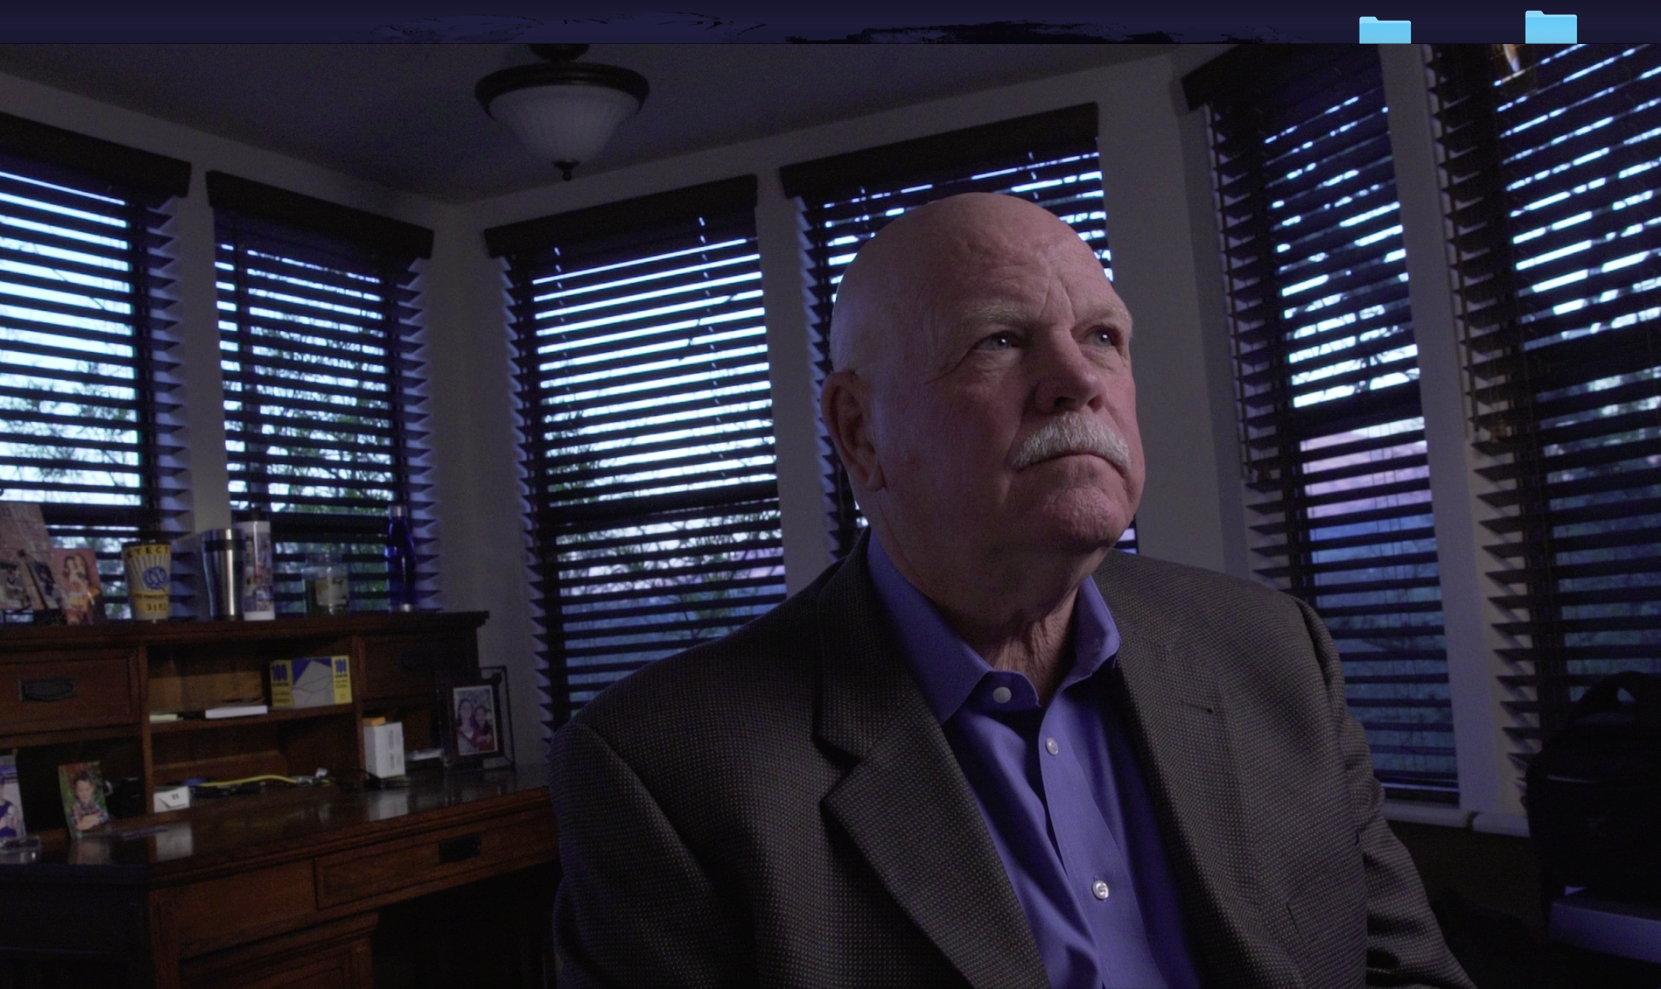 Detective Rick Jackson